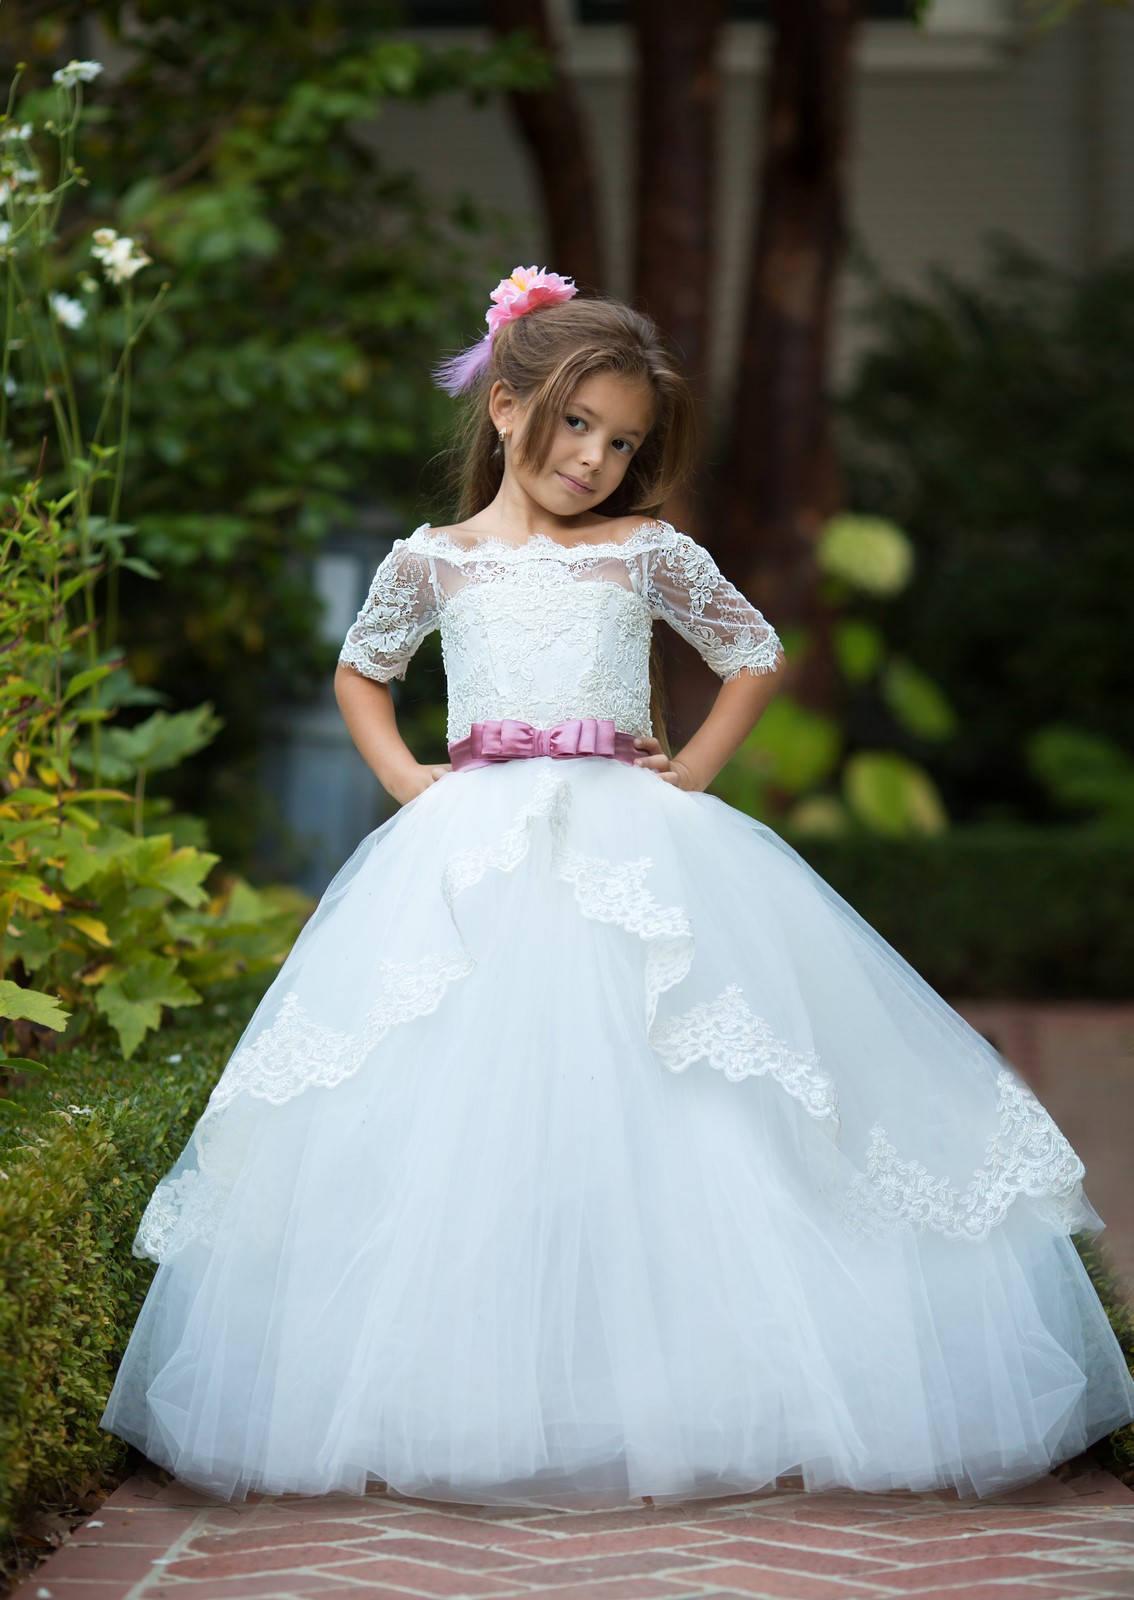 d1effaf2c2d92 White Flower Girl Dress Wedding Off Shoulder Lace Little Girl Pattern Party  Christmas Holiday Birthday Dress Train Formal Occasion Custom Dress For  Girls ...